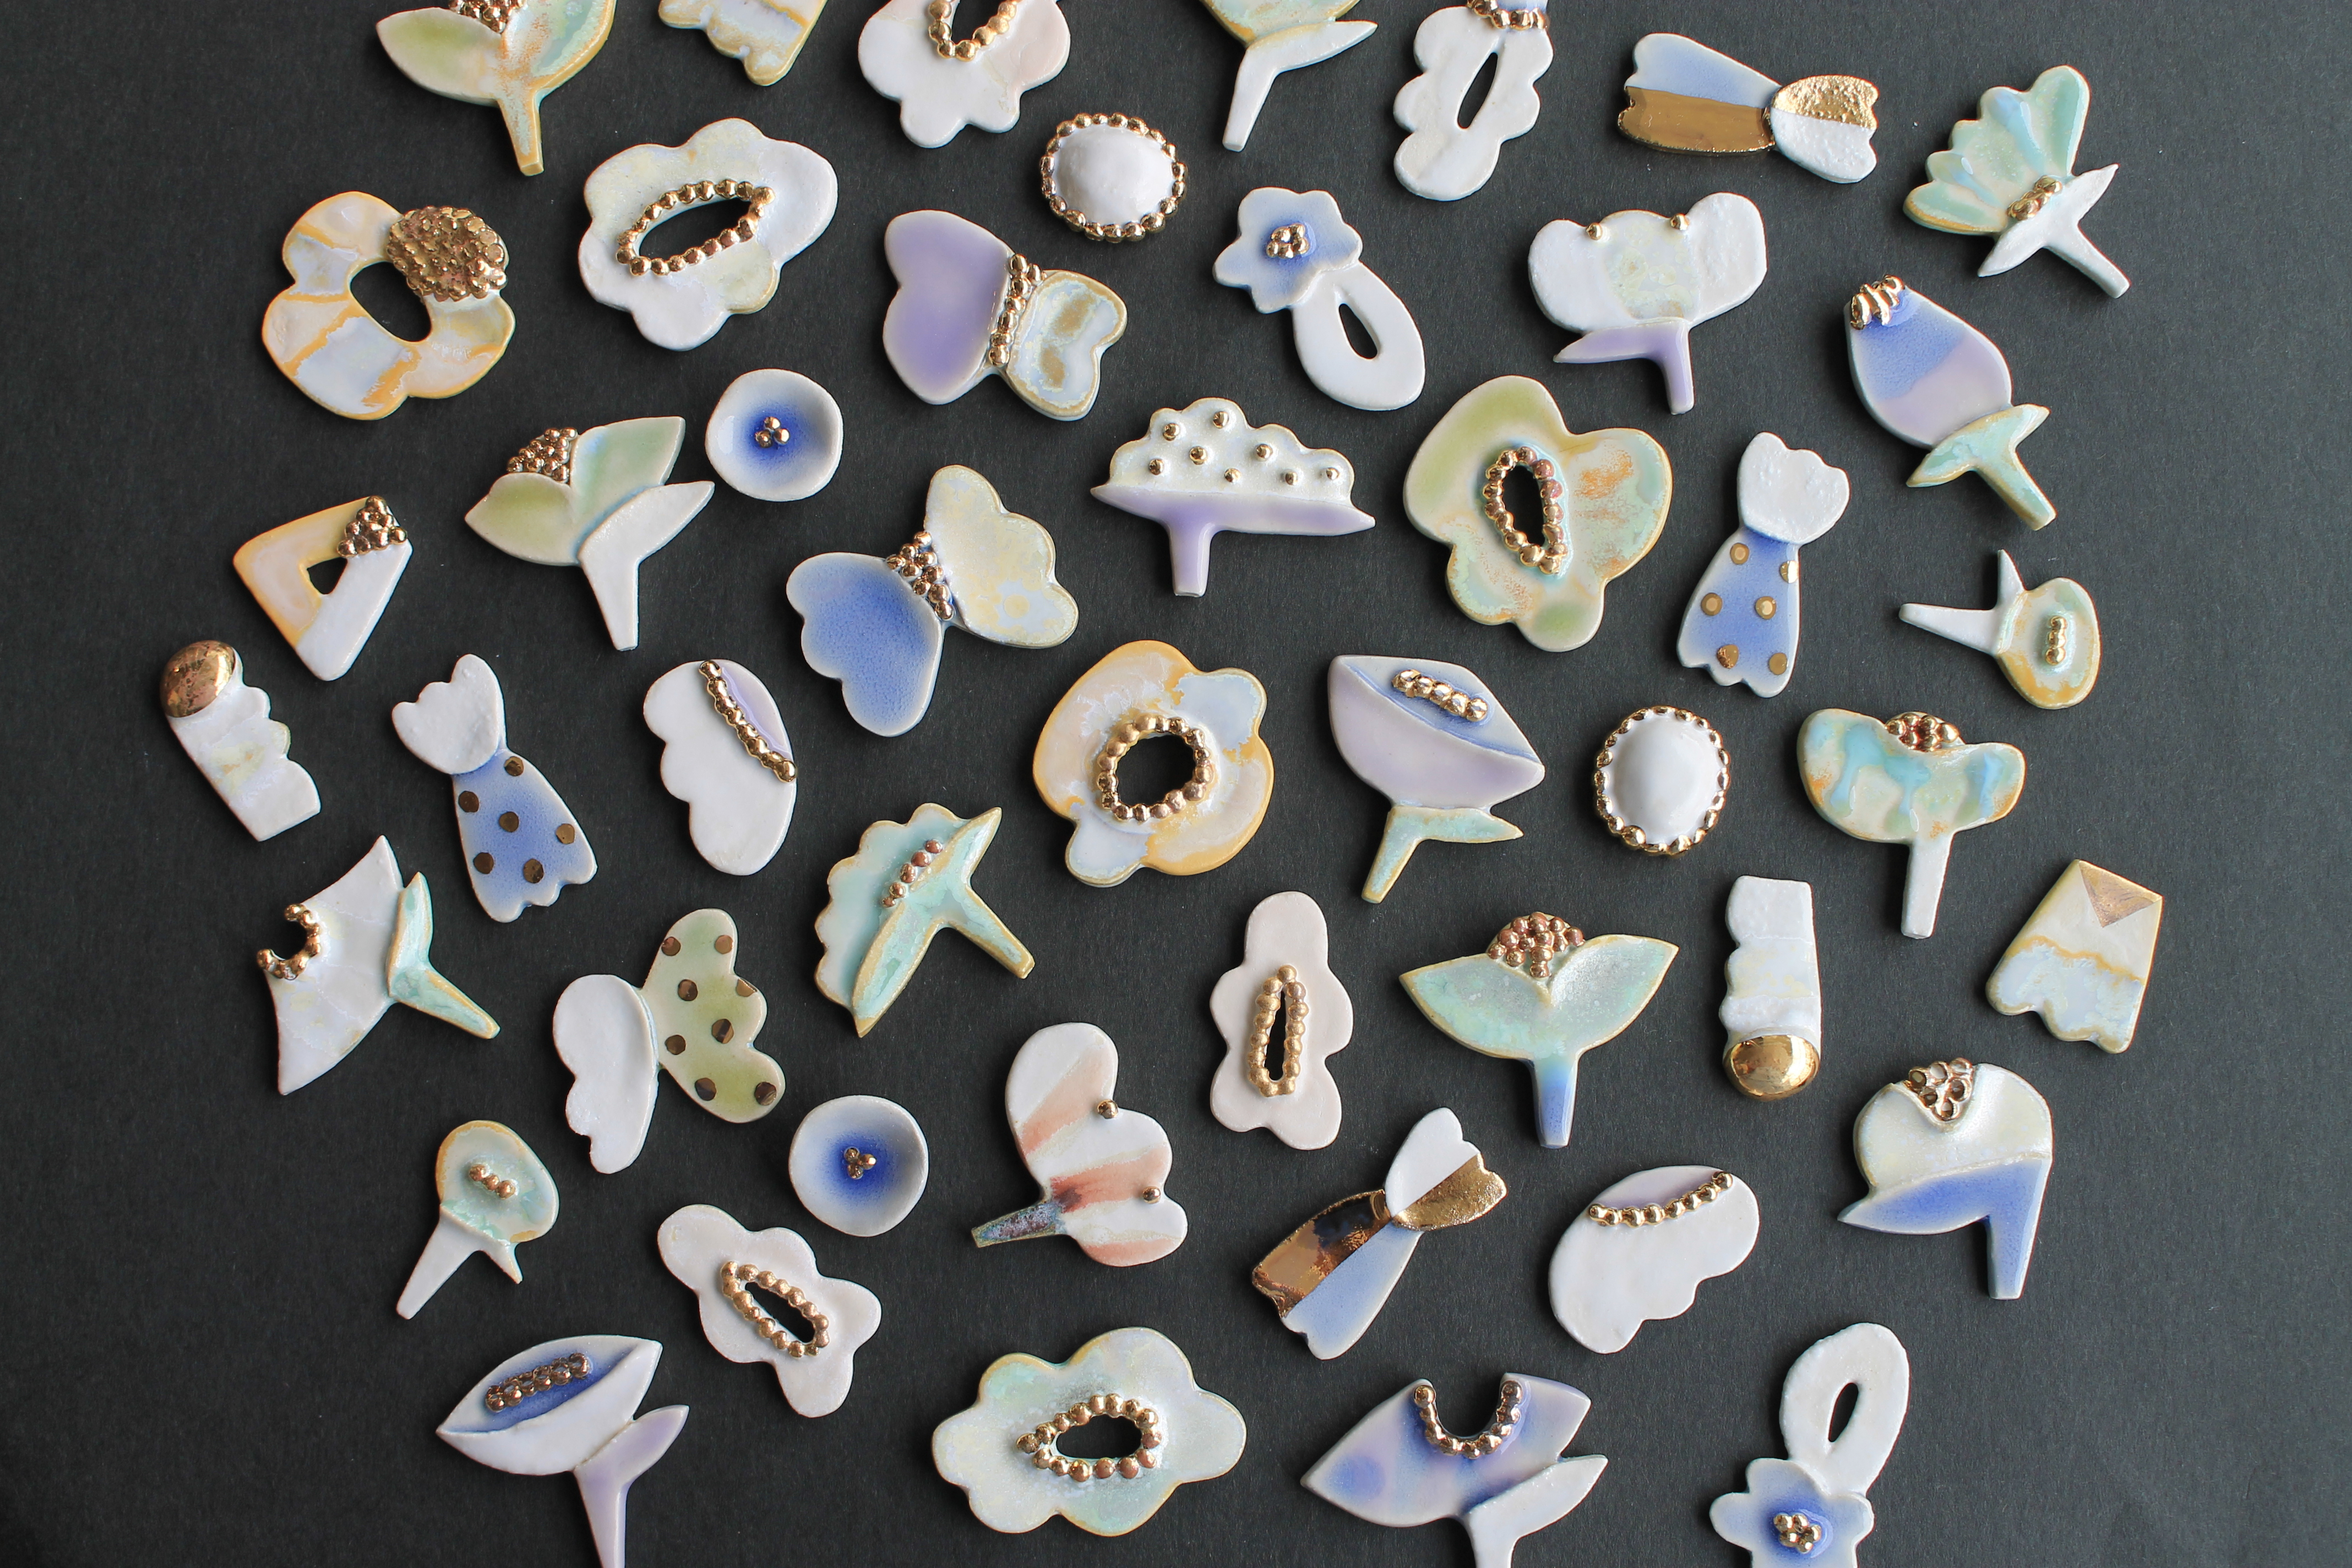 tocohana ceramics    ☝Click